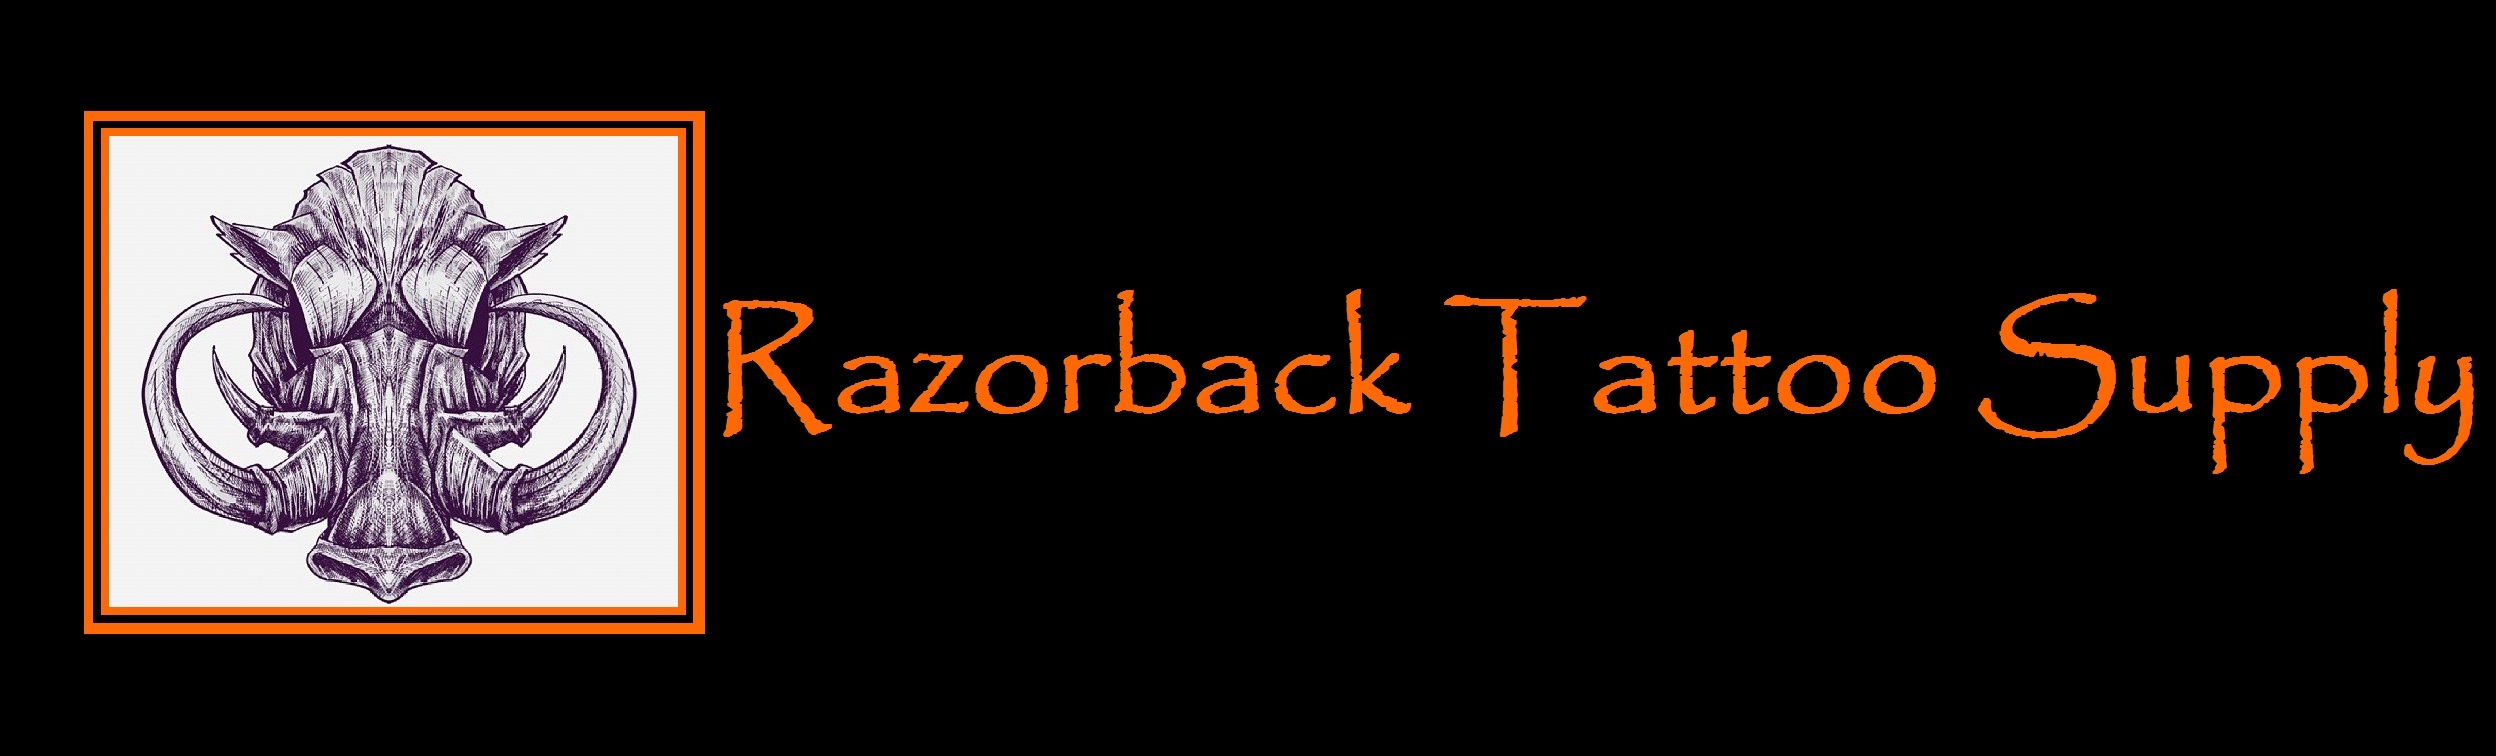 Razorback Tattoo Supply